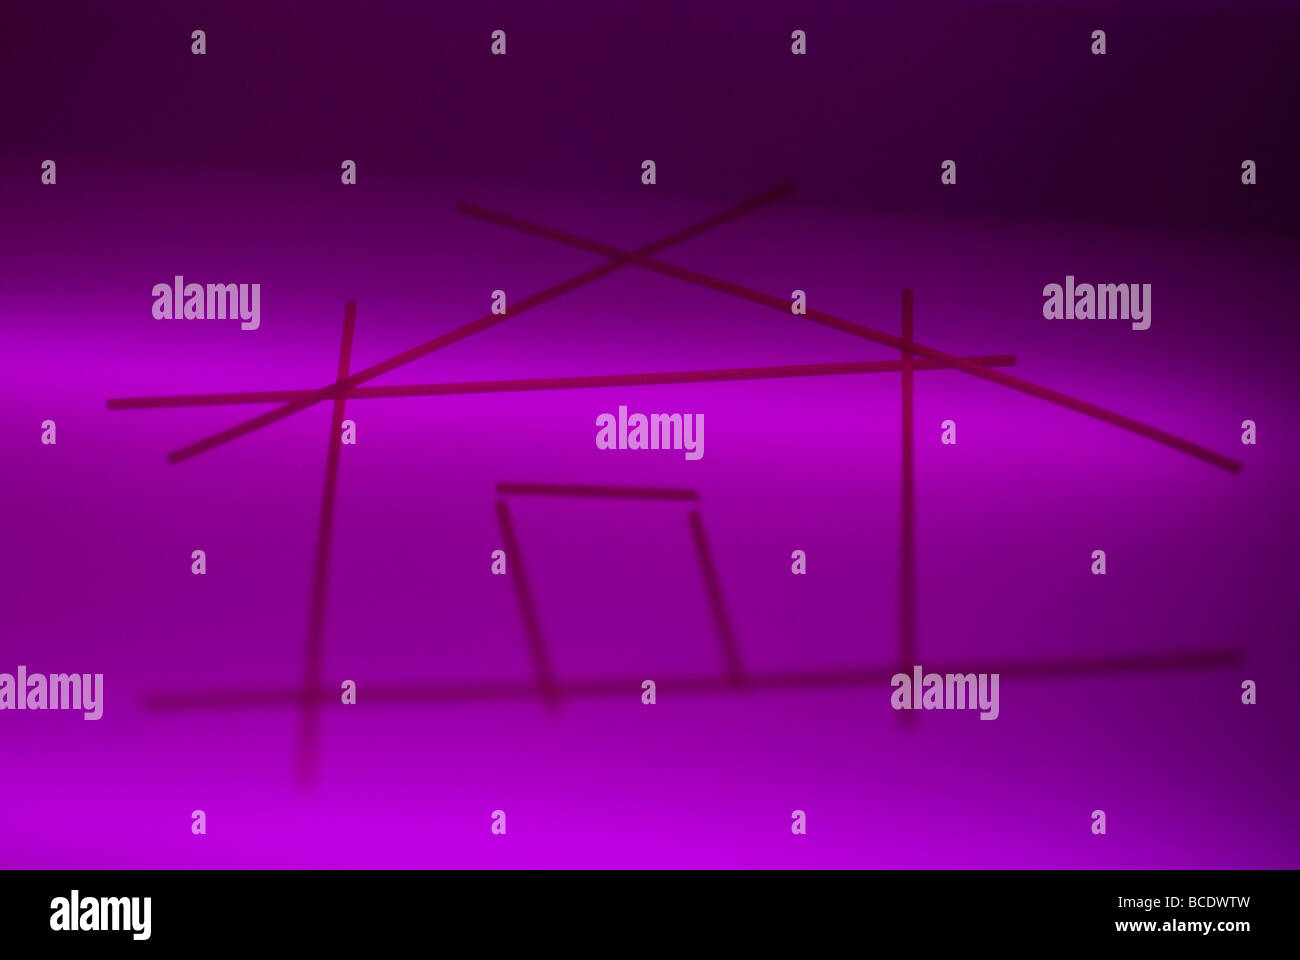 home page simbol. Internet web site design - Stock Image